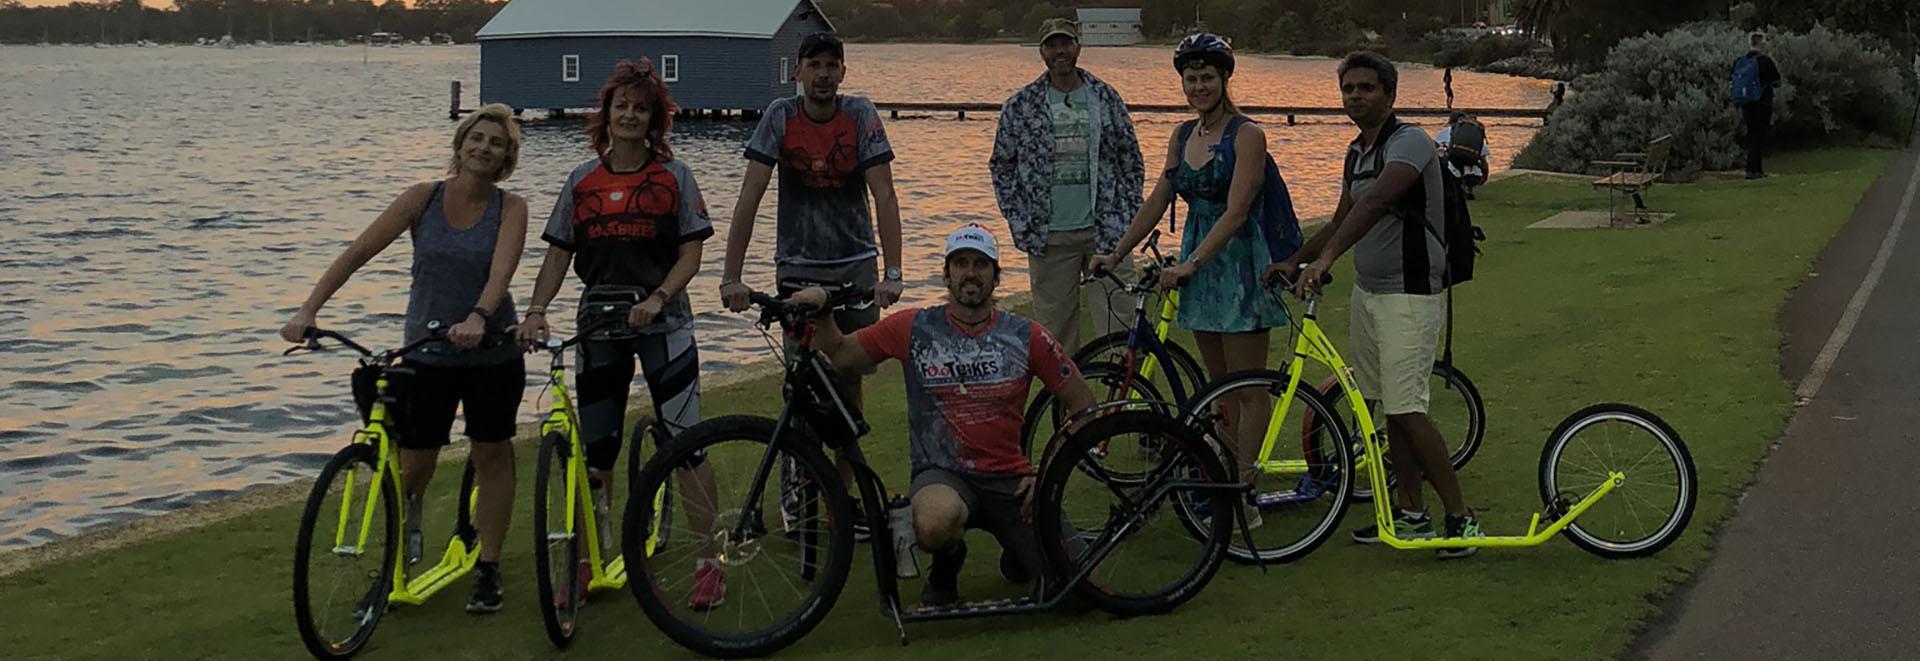 Social Rides on Footbikes